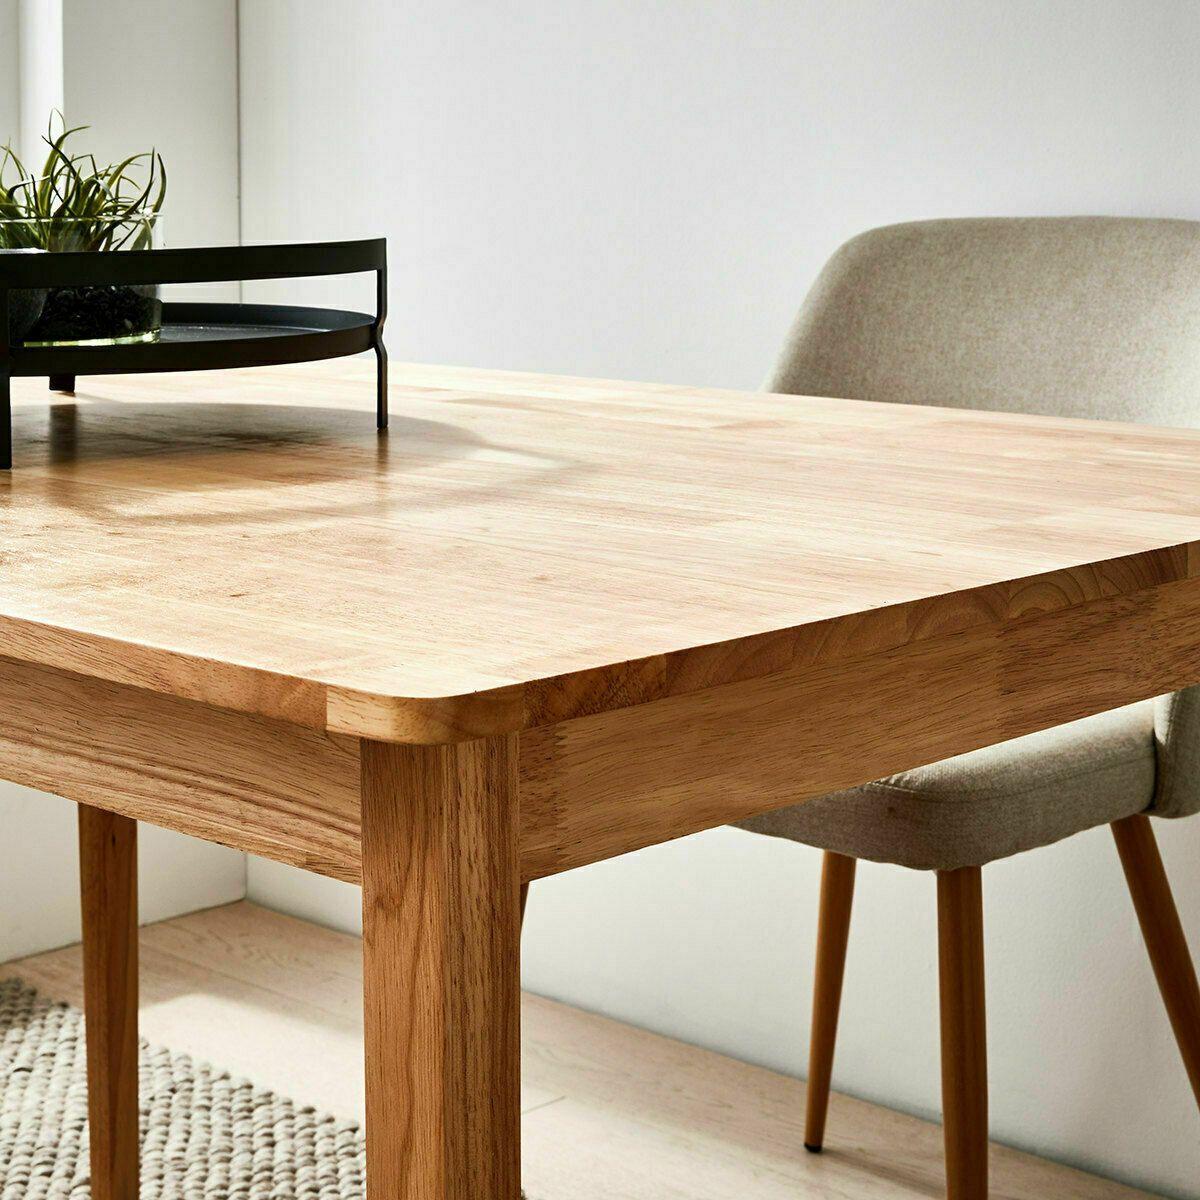 New Stewart Dining Table Stylish Elegant Easy Assemble Premium Living 2021 .